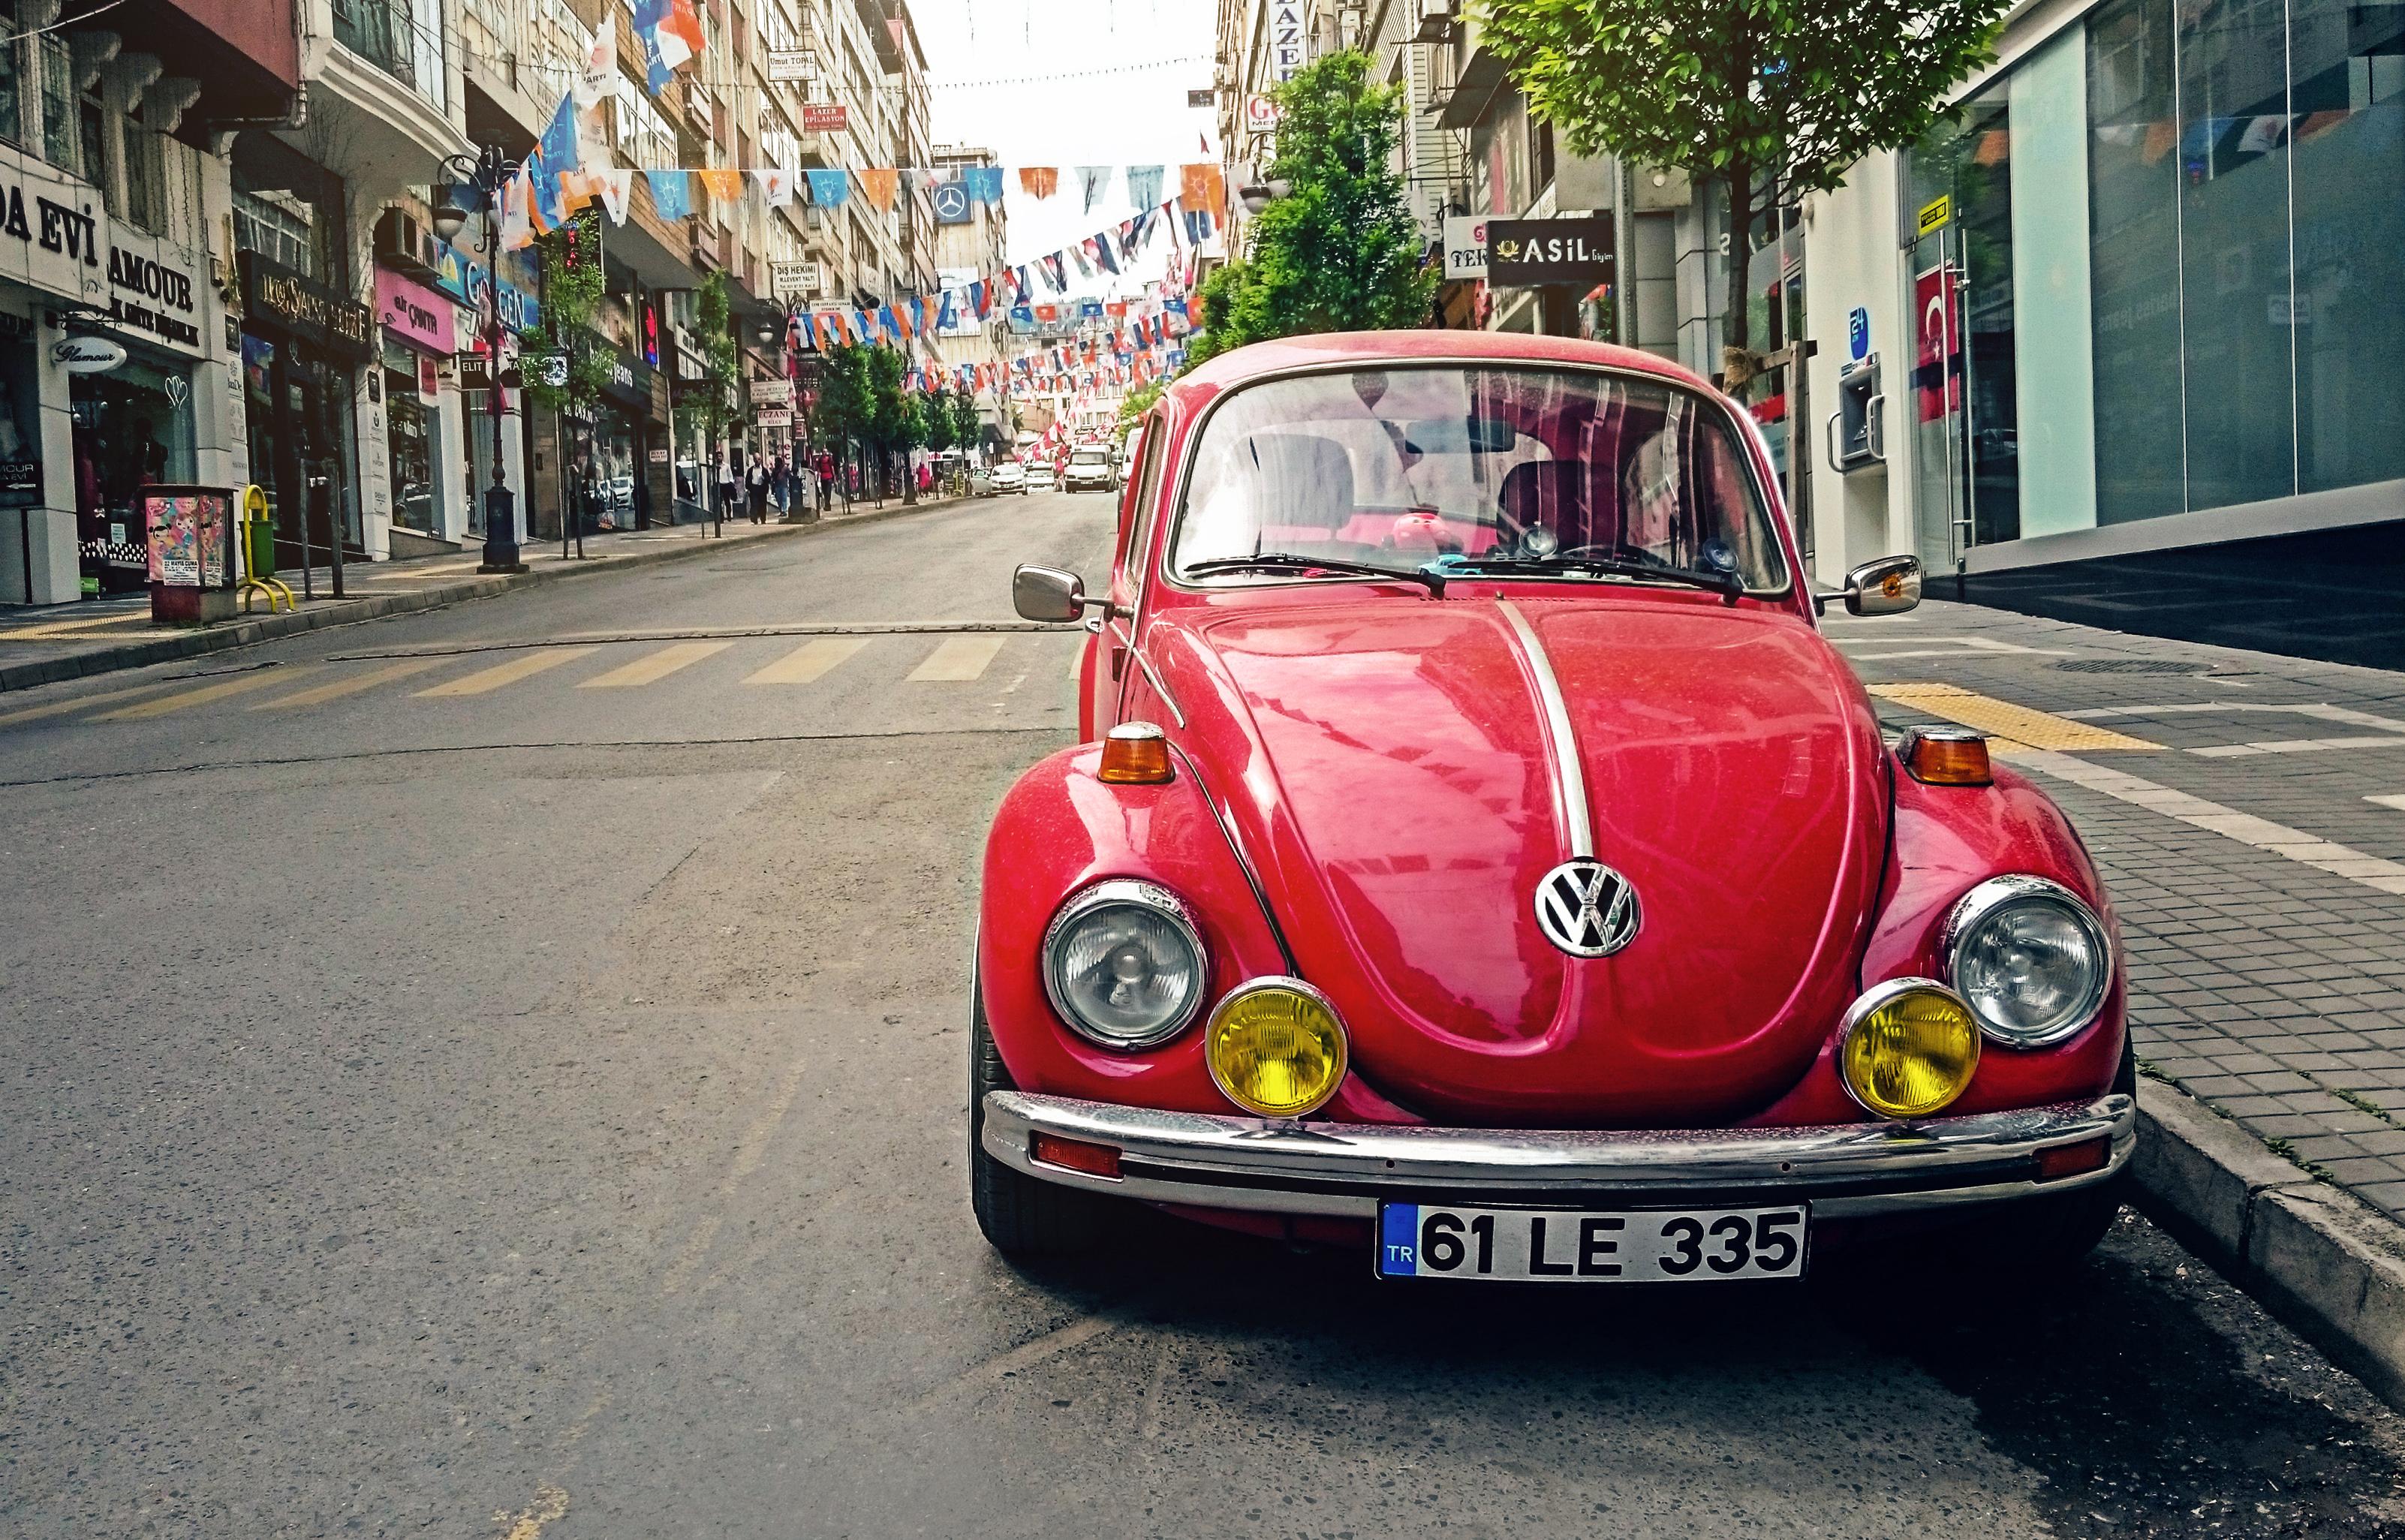 Very best Free Images : road, street, sidewalk, urban, pavement, red  FE06